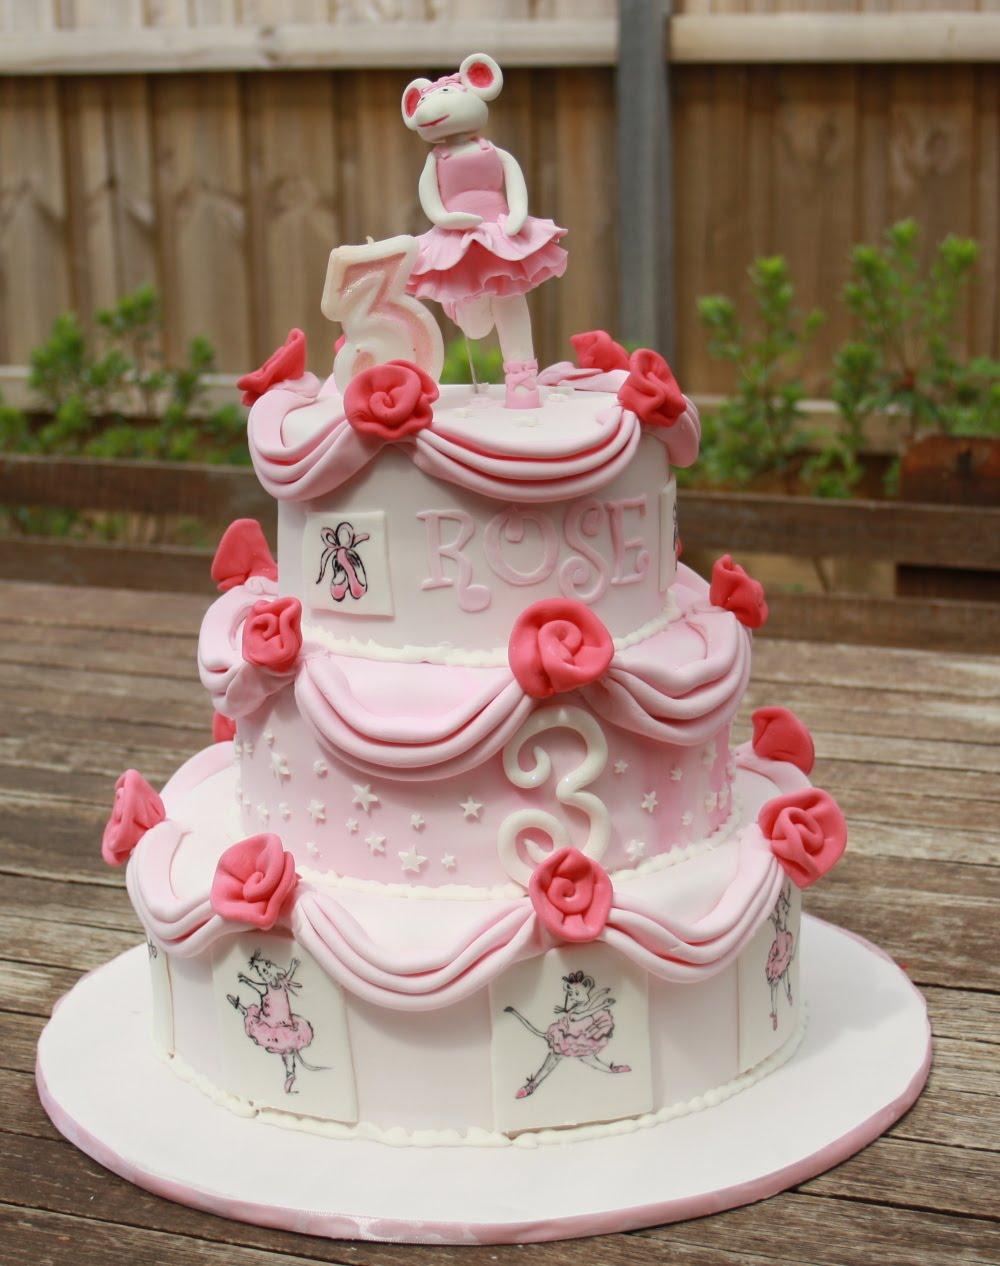 Beccas Musings My Little Girls Birthday Cakes